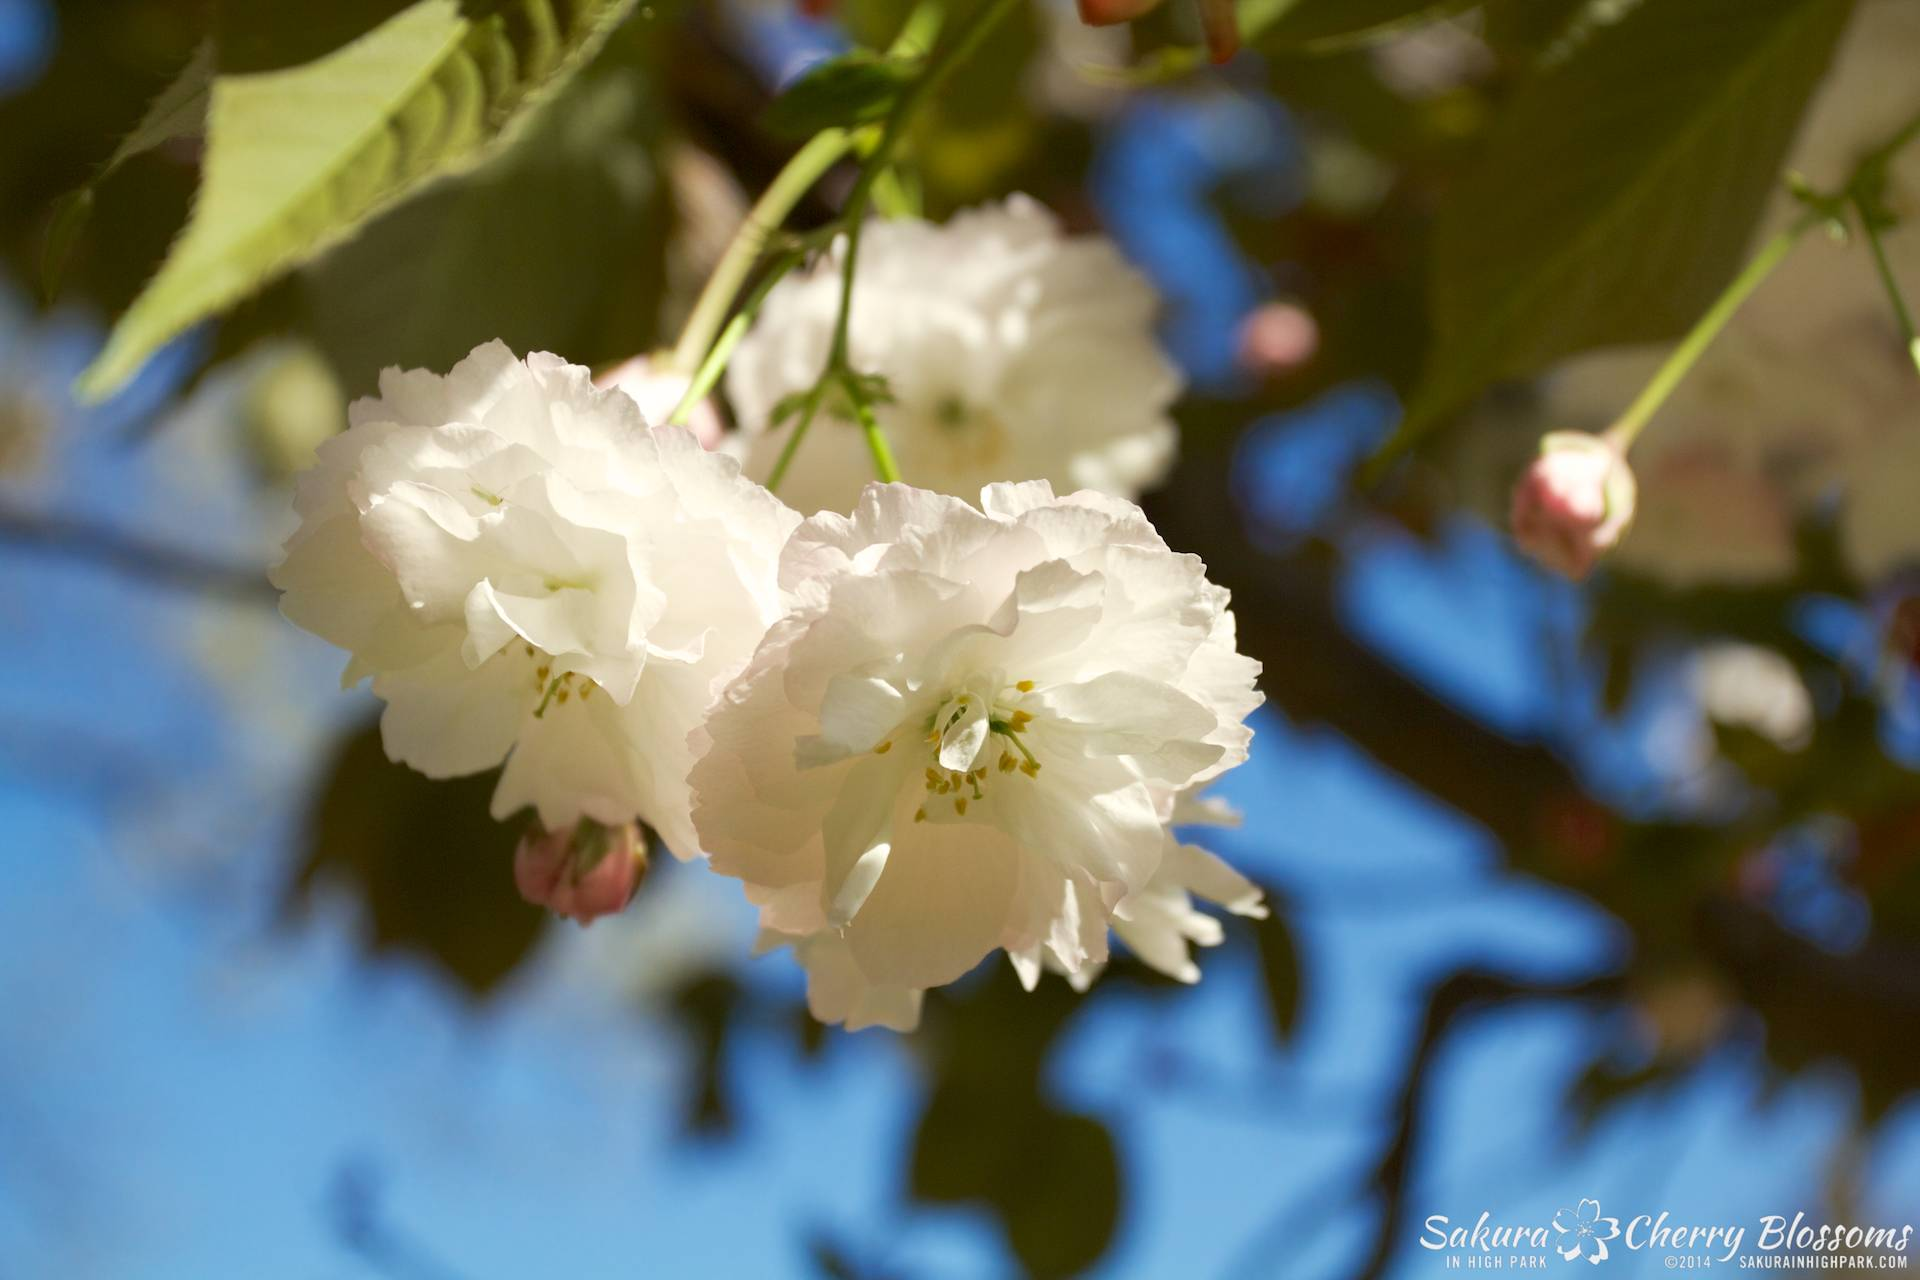 SakuraInHighPark-May2414-389.jpg